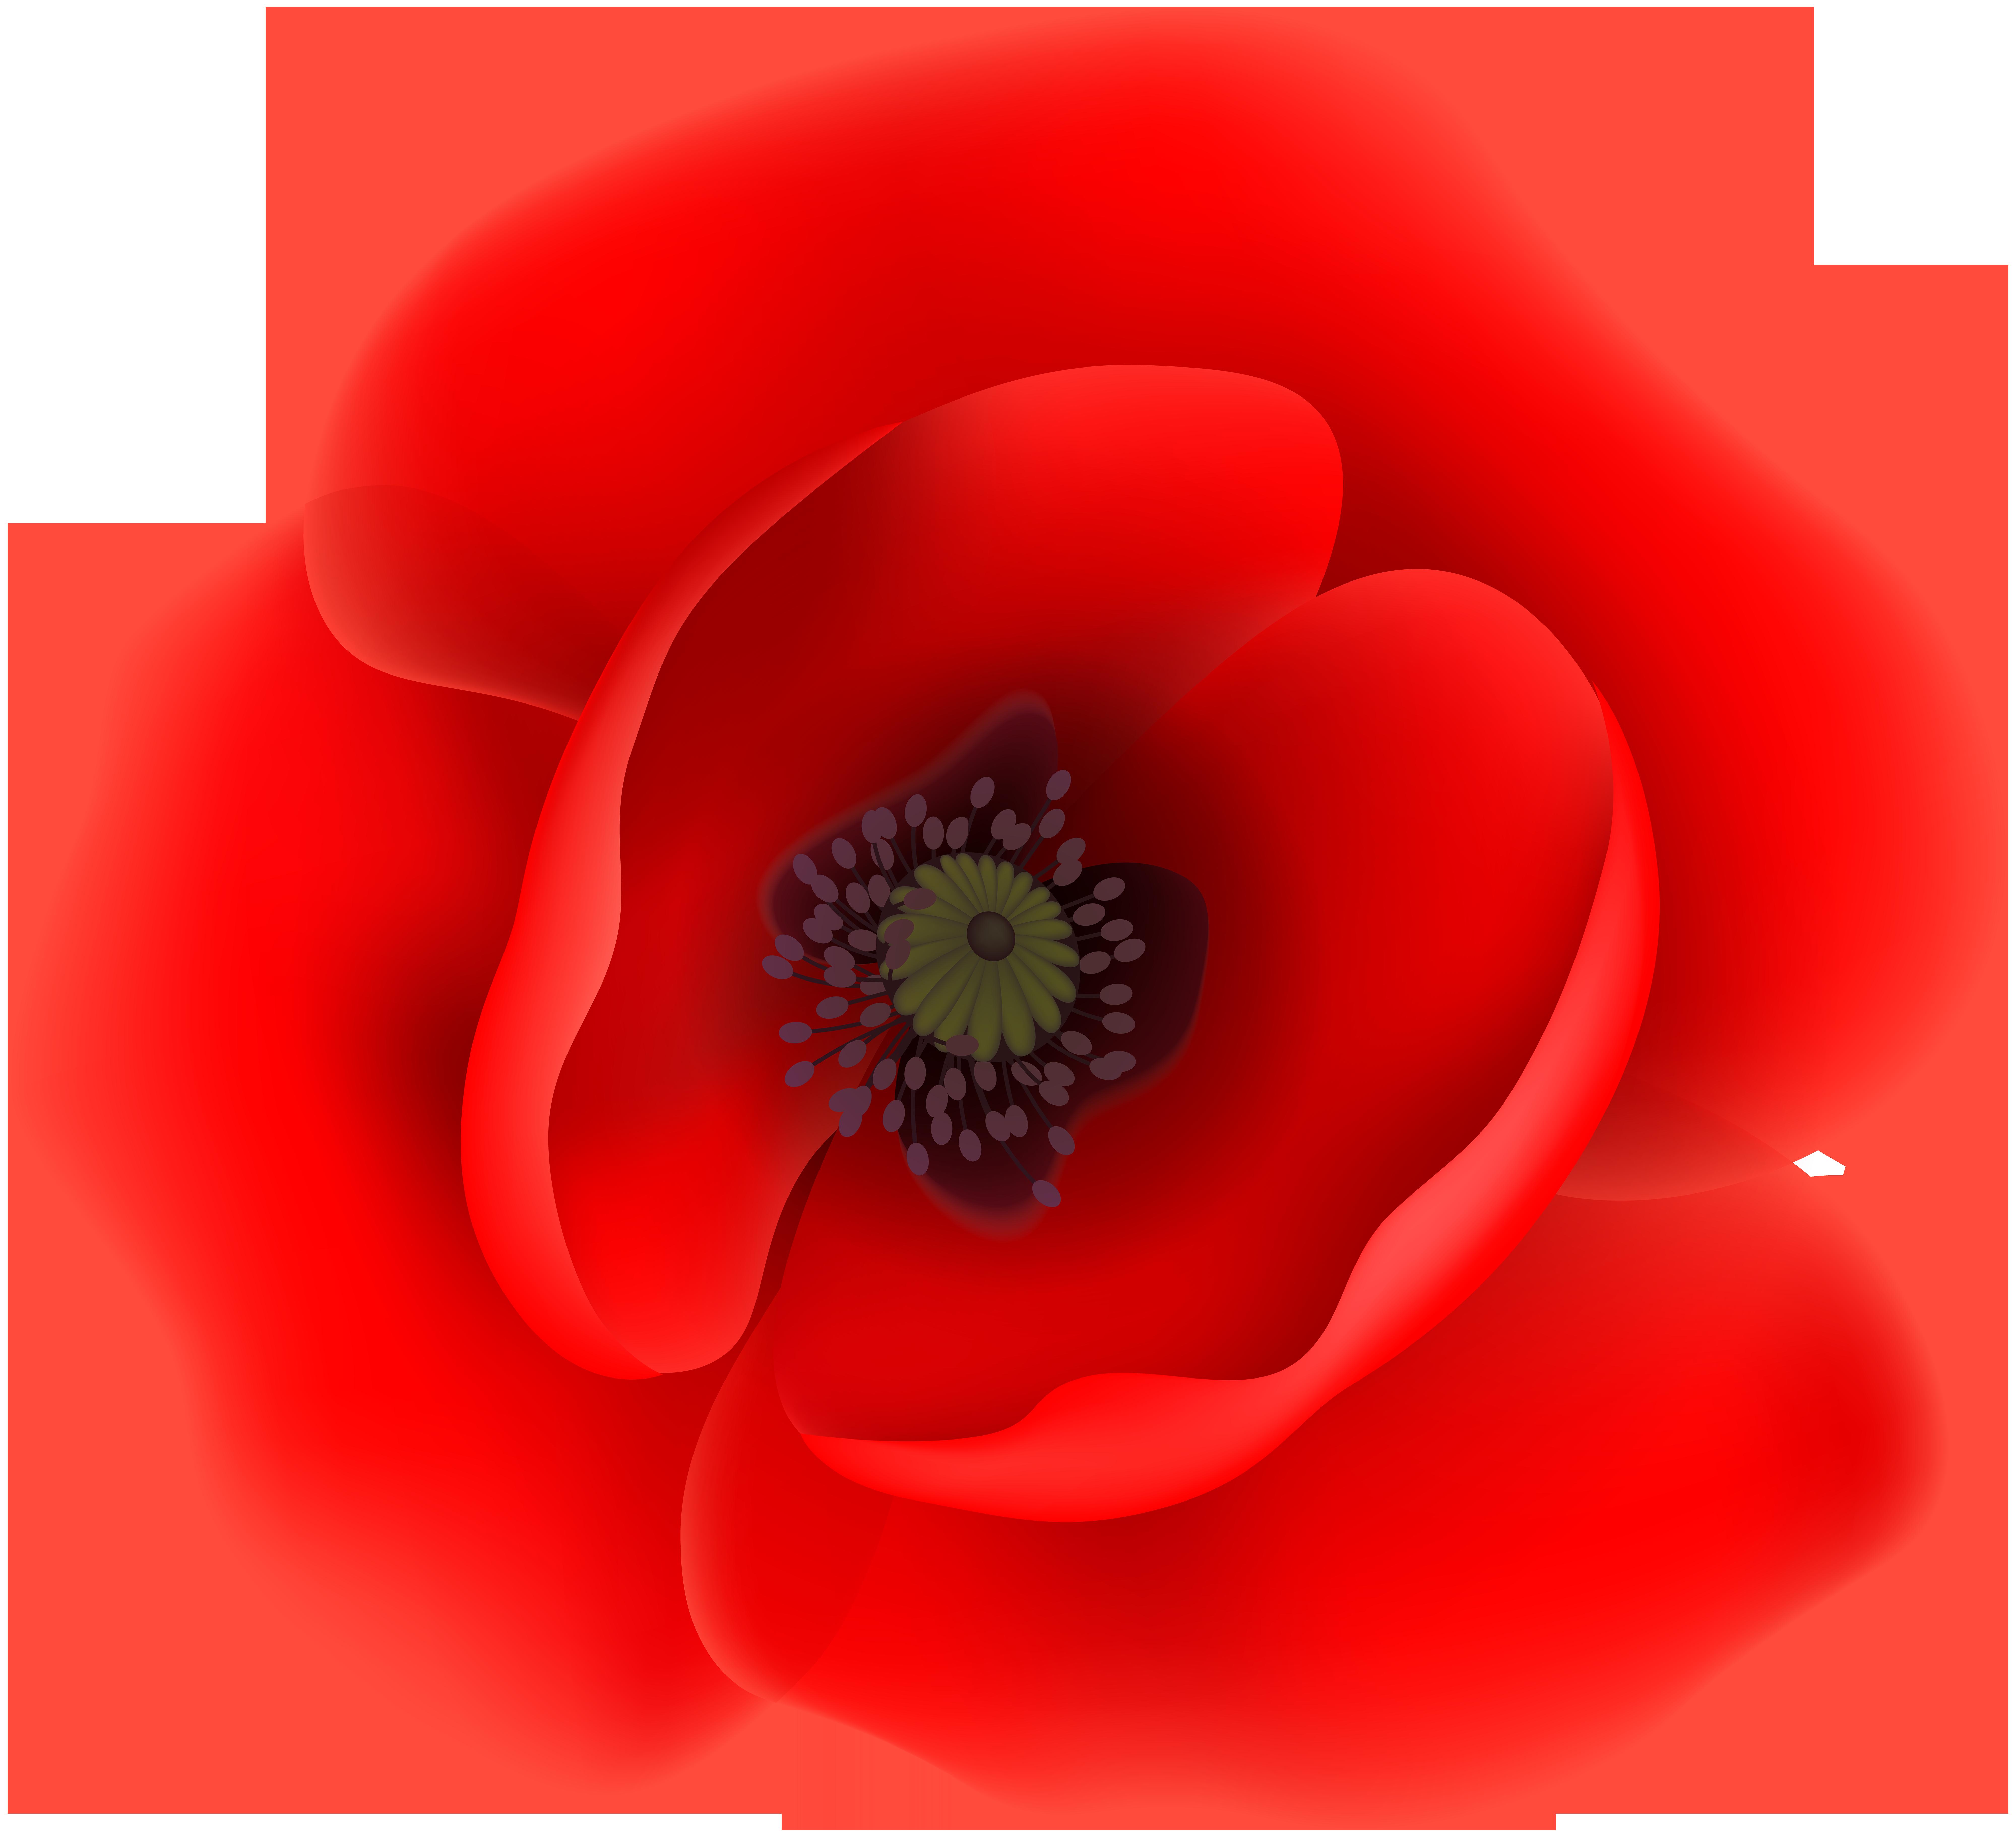 8000x7288 Poppy Flower Clip Art Transparent Imageu200b Gallery Yopriceville